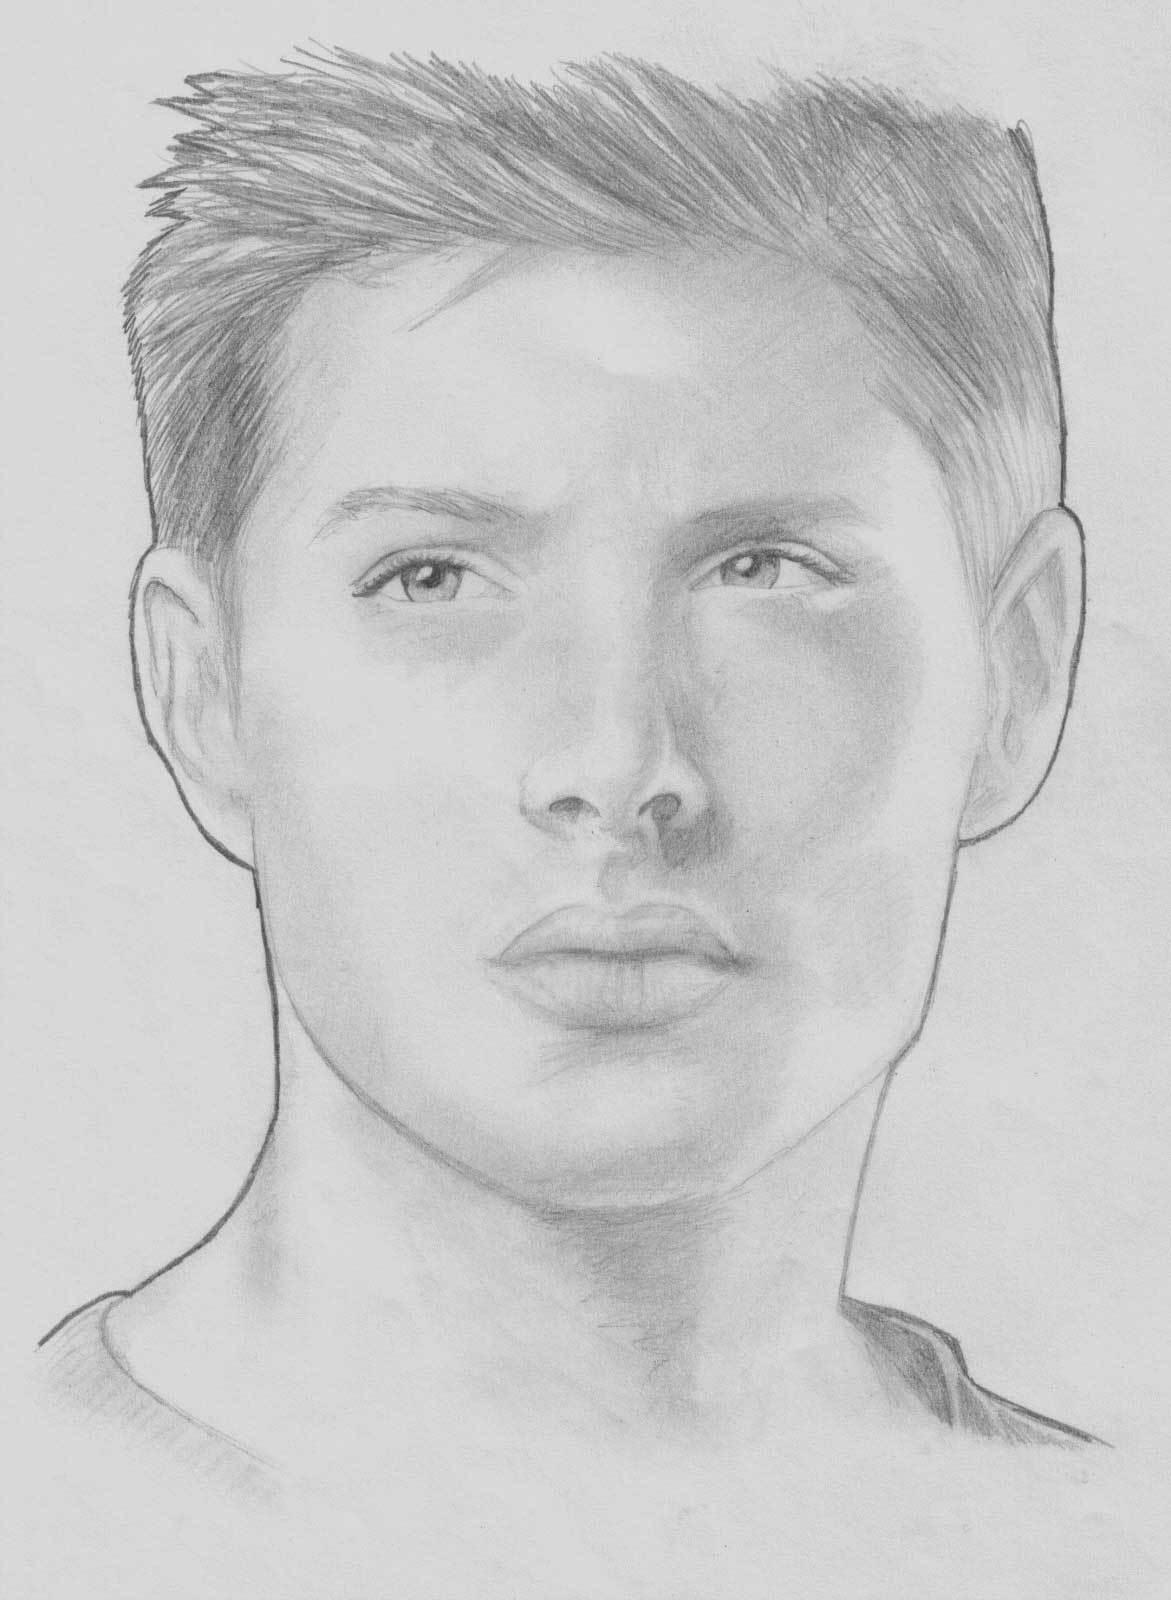 Арт рисунки дженсена эклза 8